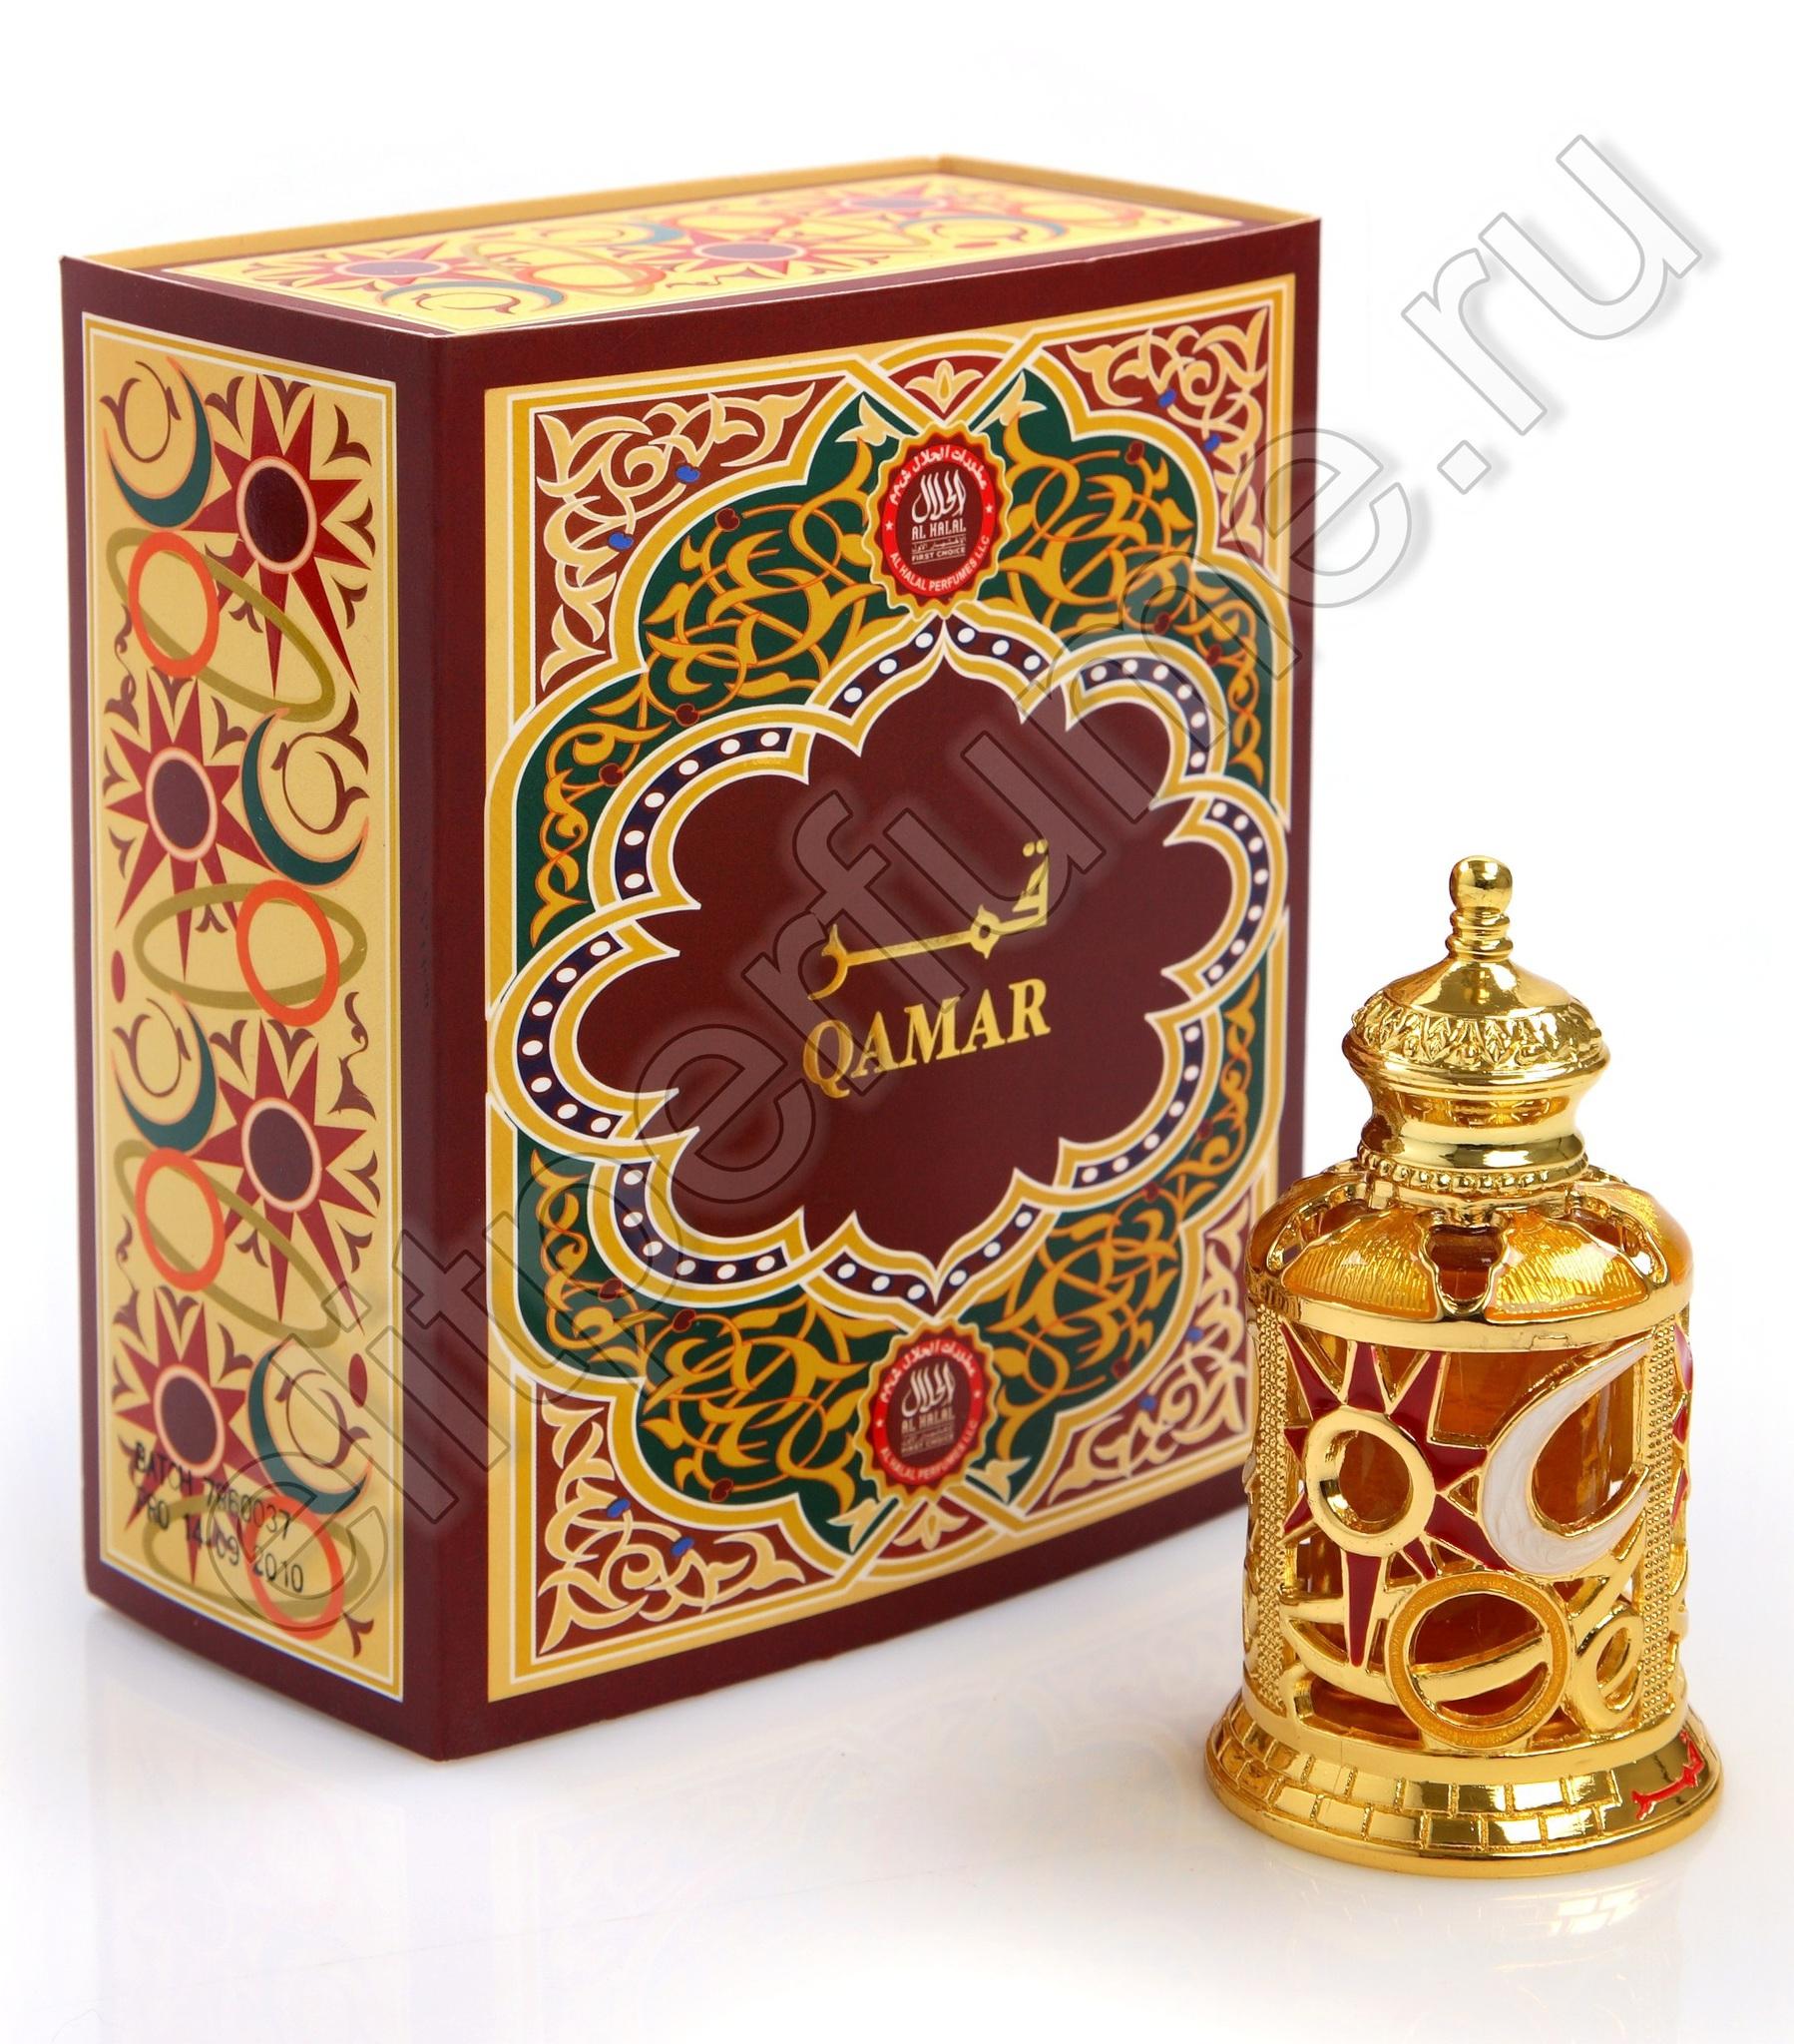 Камар Qamar 15 мл арабские масляные духи от Аль Харамайн Al Haramain Perfumes